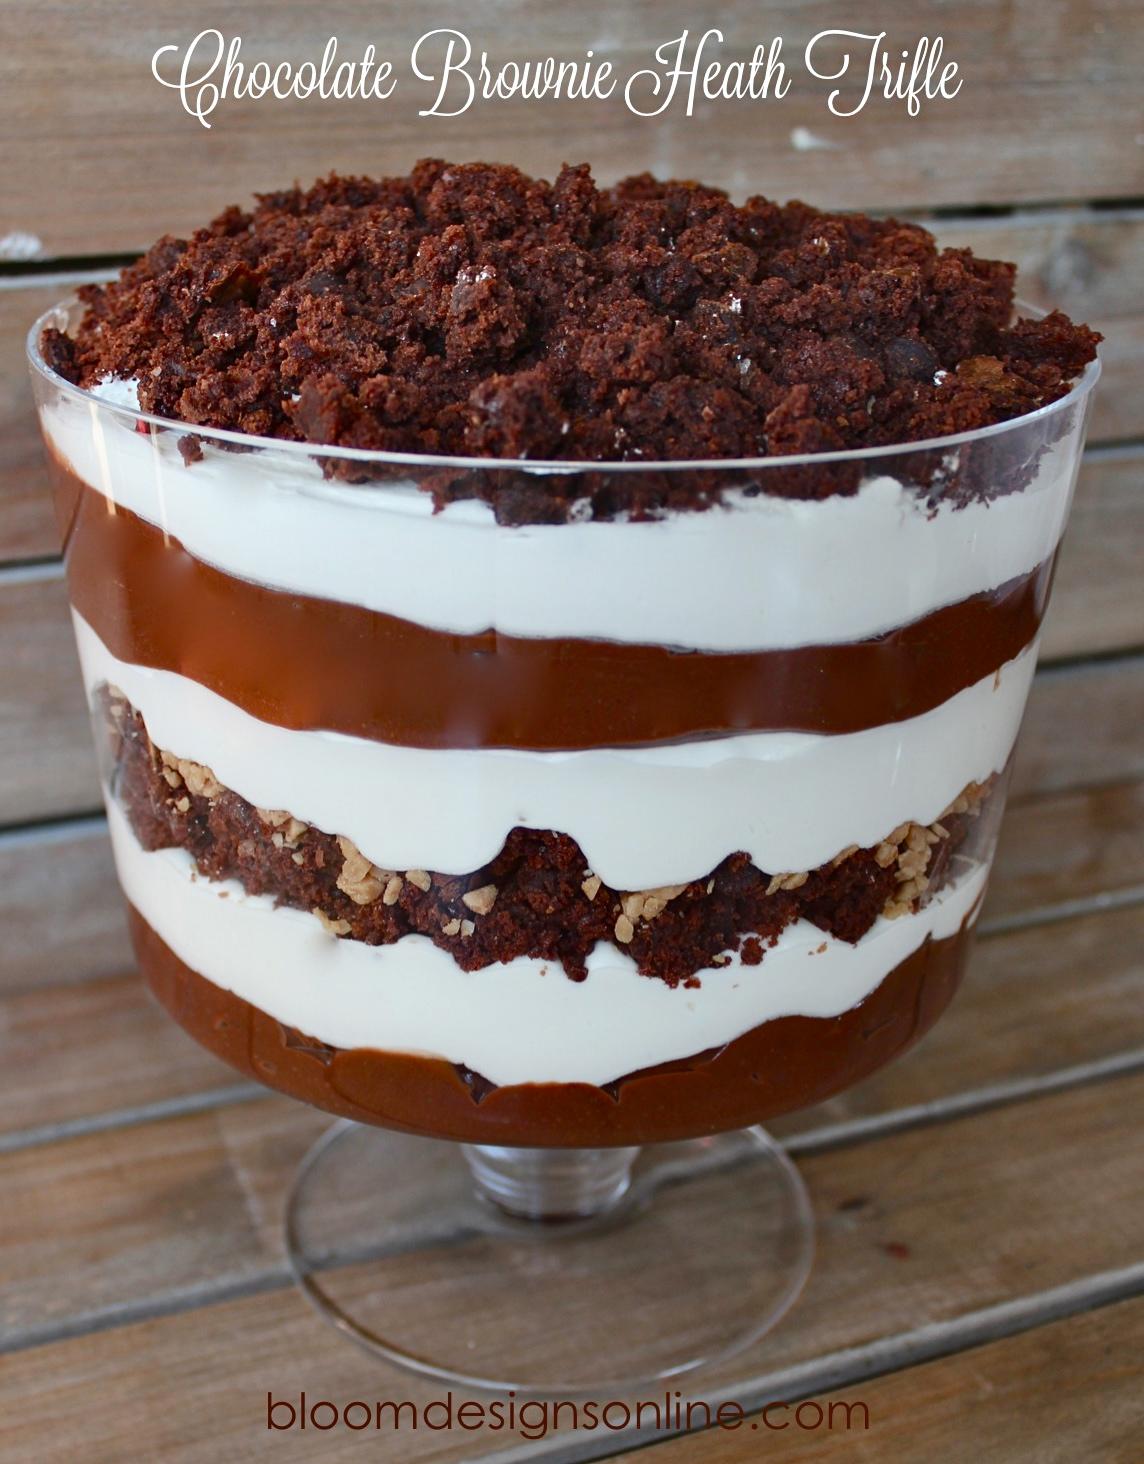 Chocolate Brownie Heath Trifle Bloom Designs